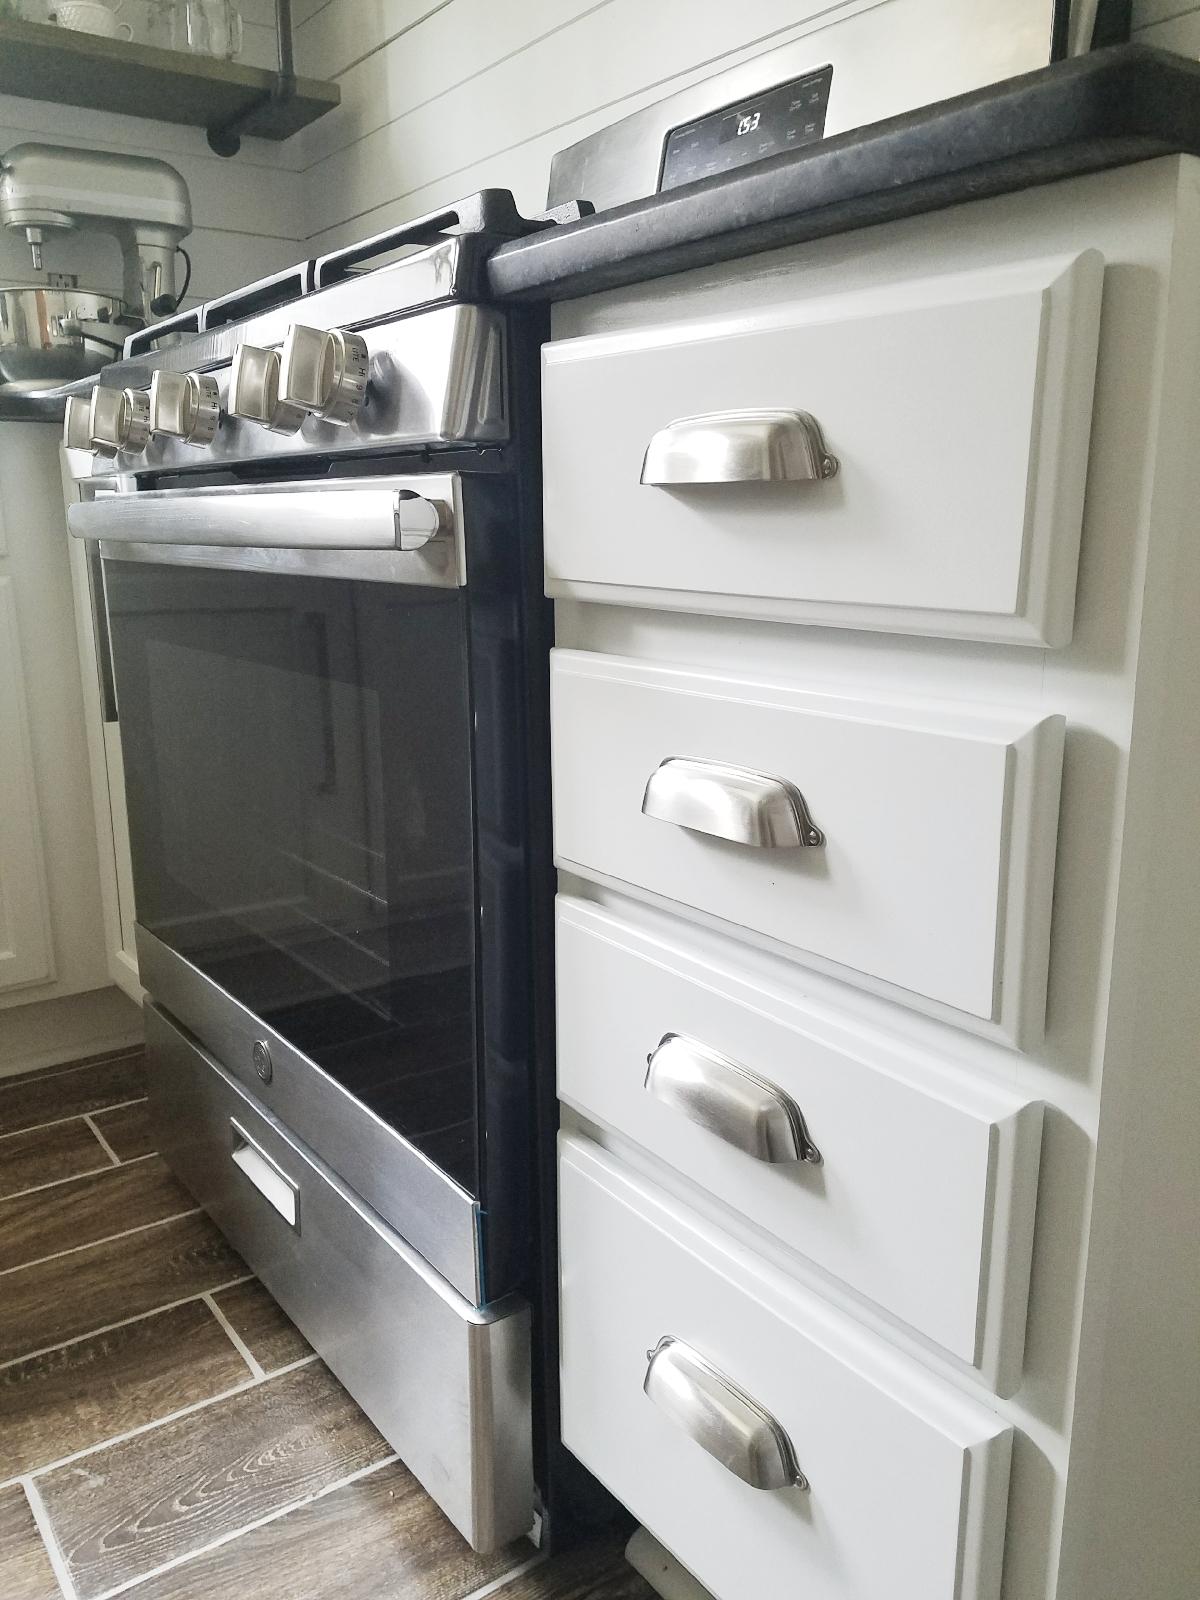 Haymount Homes Greenland Drive kitchen cabinets.jpg